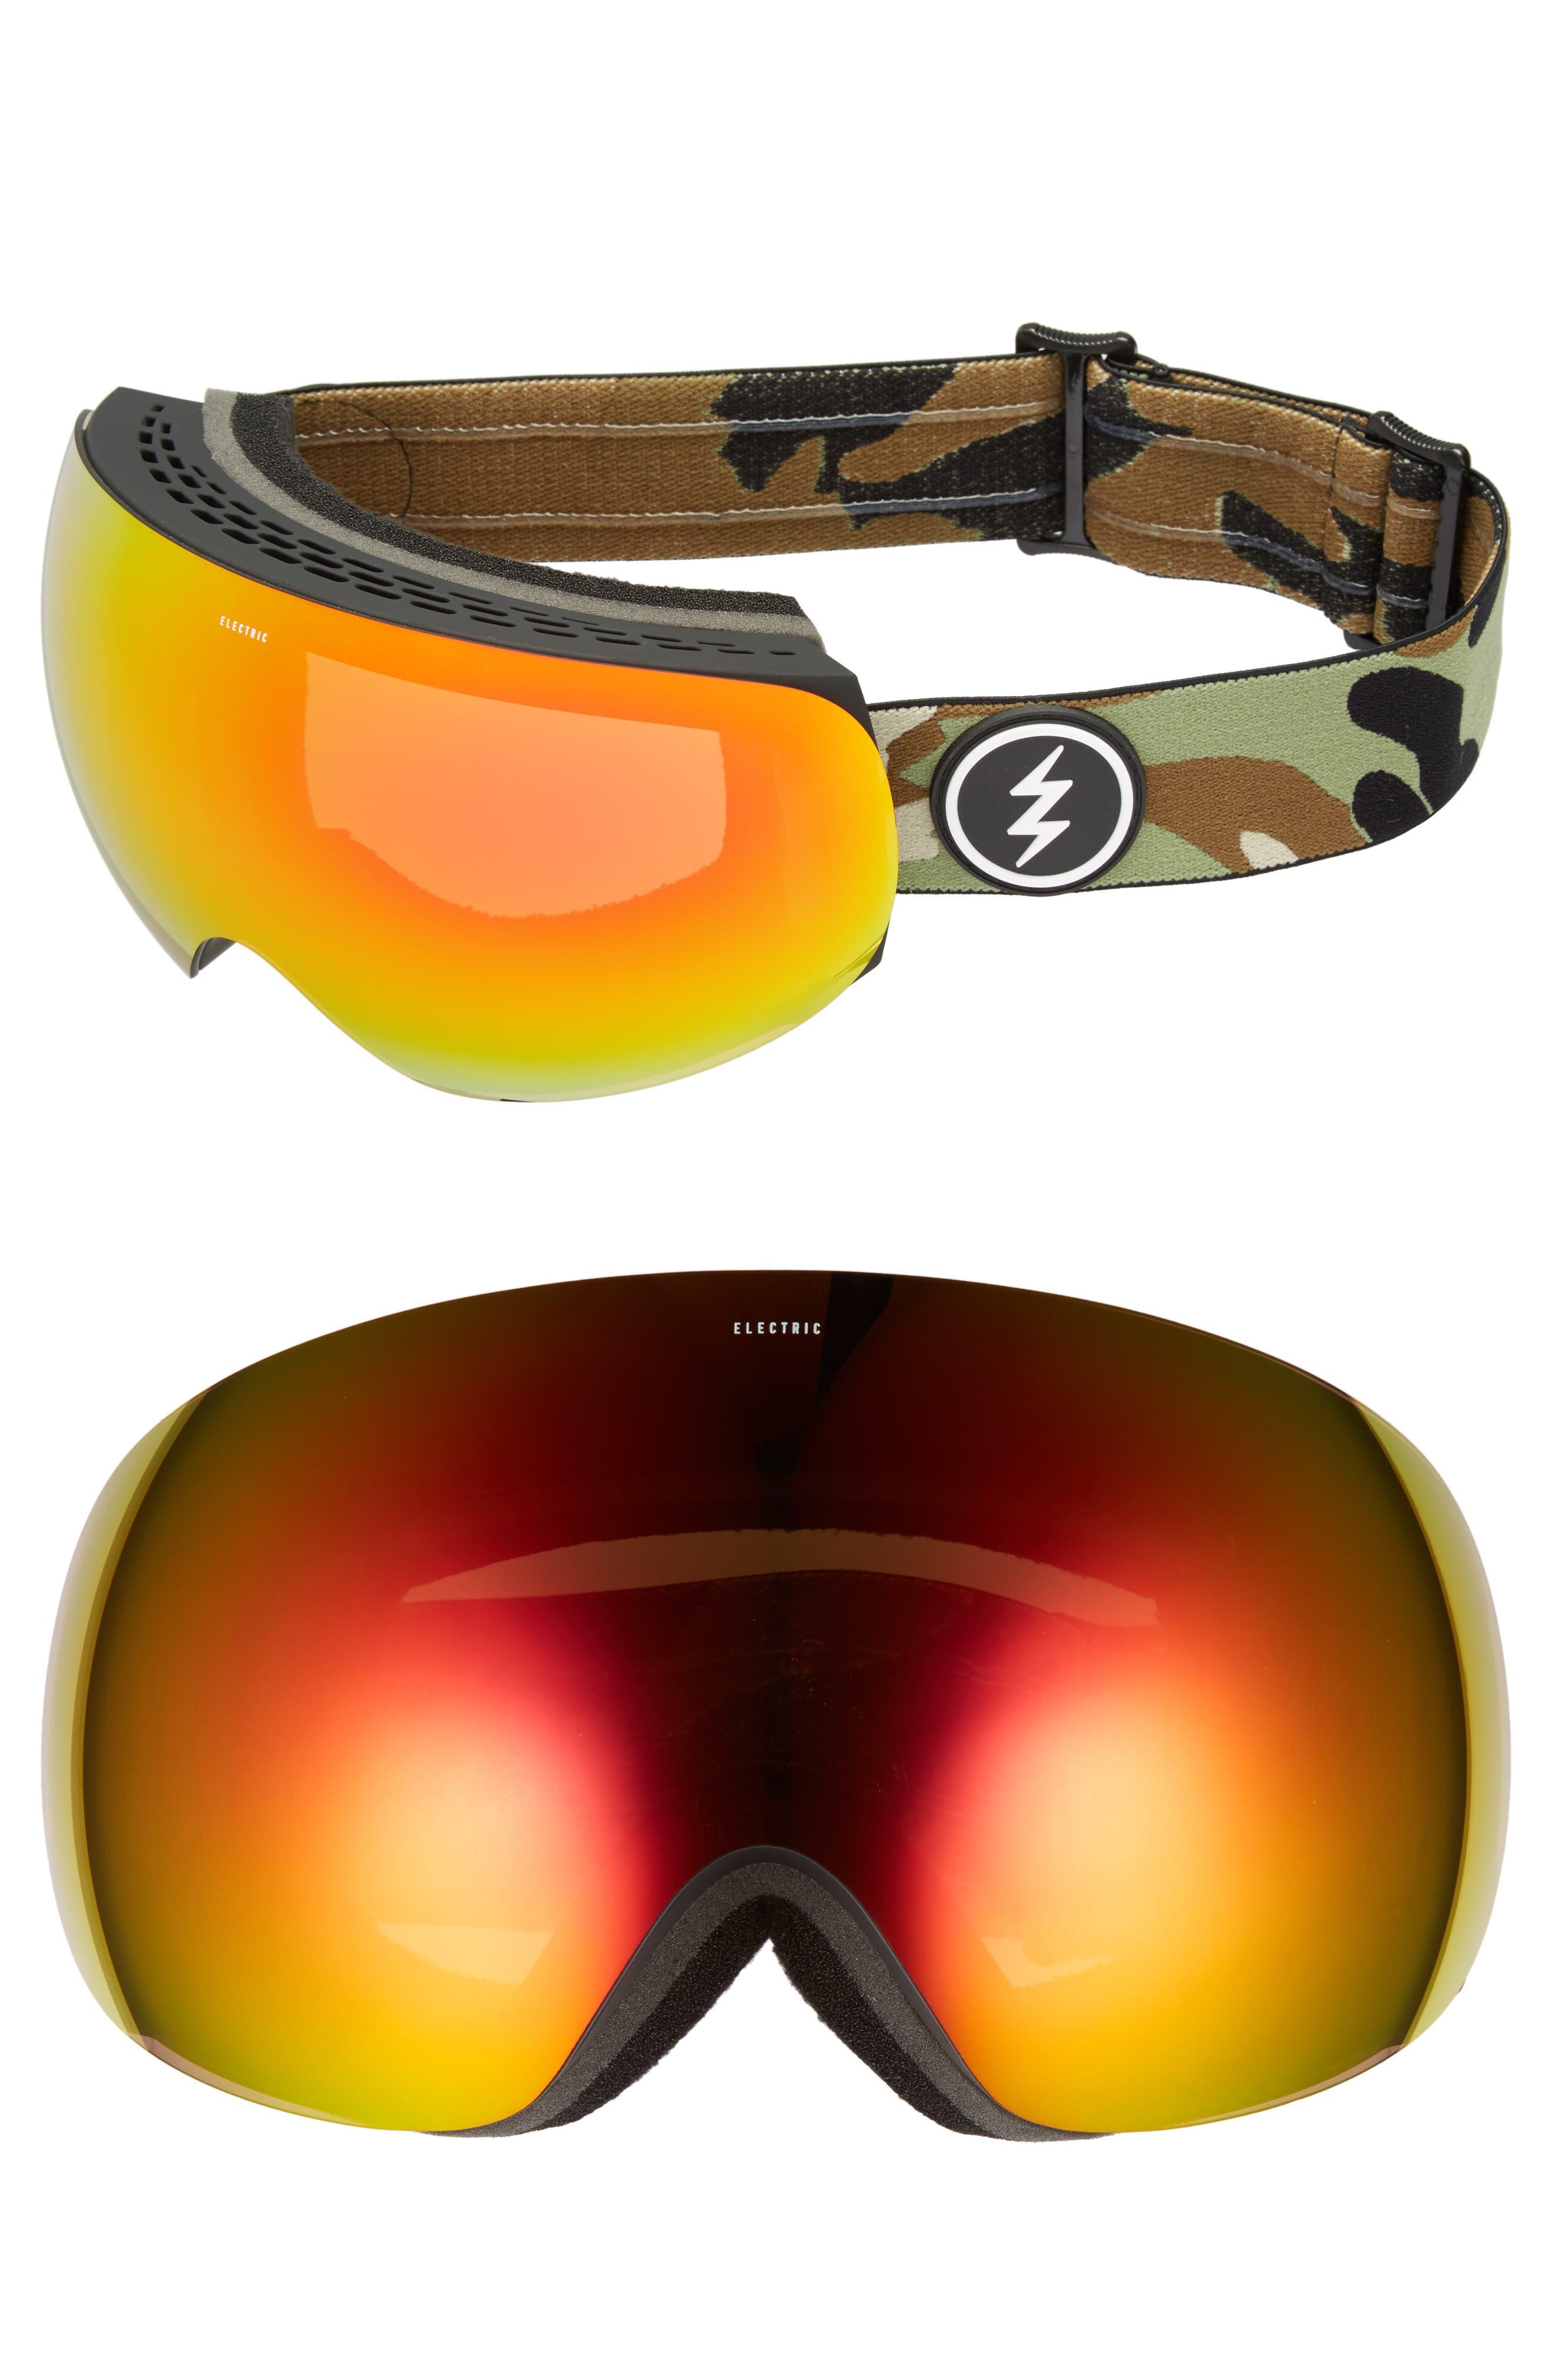 Main Image - ELECTRIC EG3 Snow Goggles